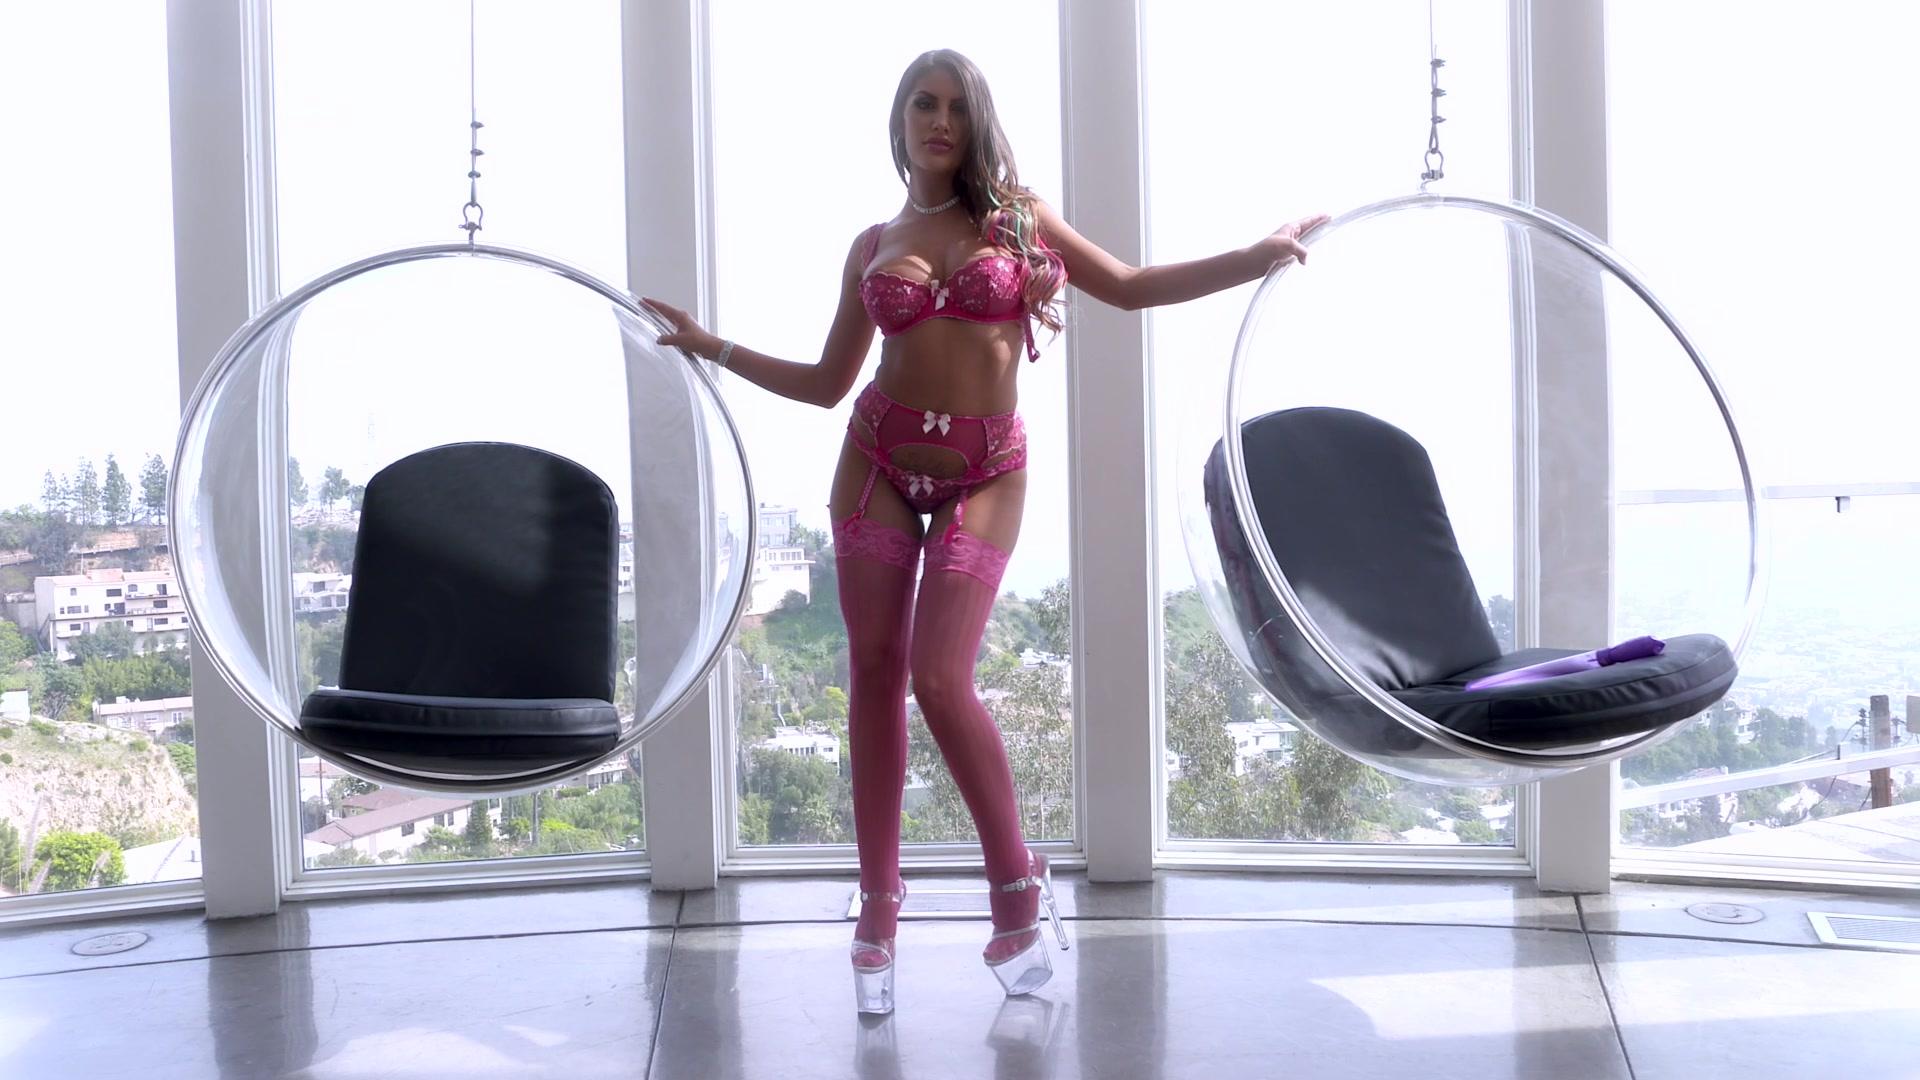 Dream Fucks, 2017 Porn DVD, Jules Jordan Video, Jules Jordan, Nikki Benz, Rachel Starr, Amia Miley, August Ames, All Sex, Big Boobs